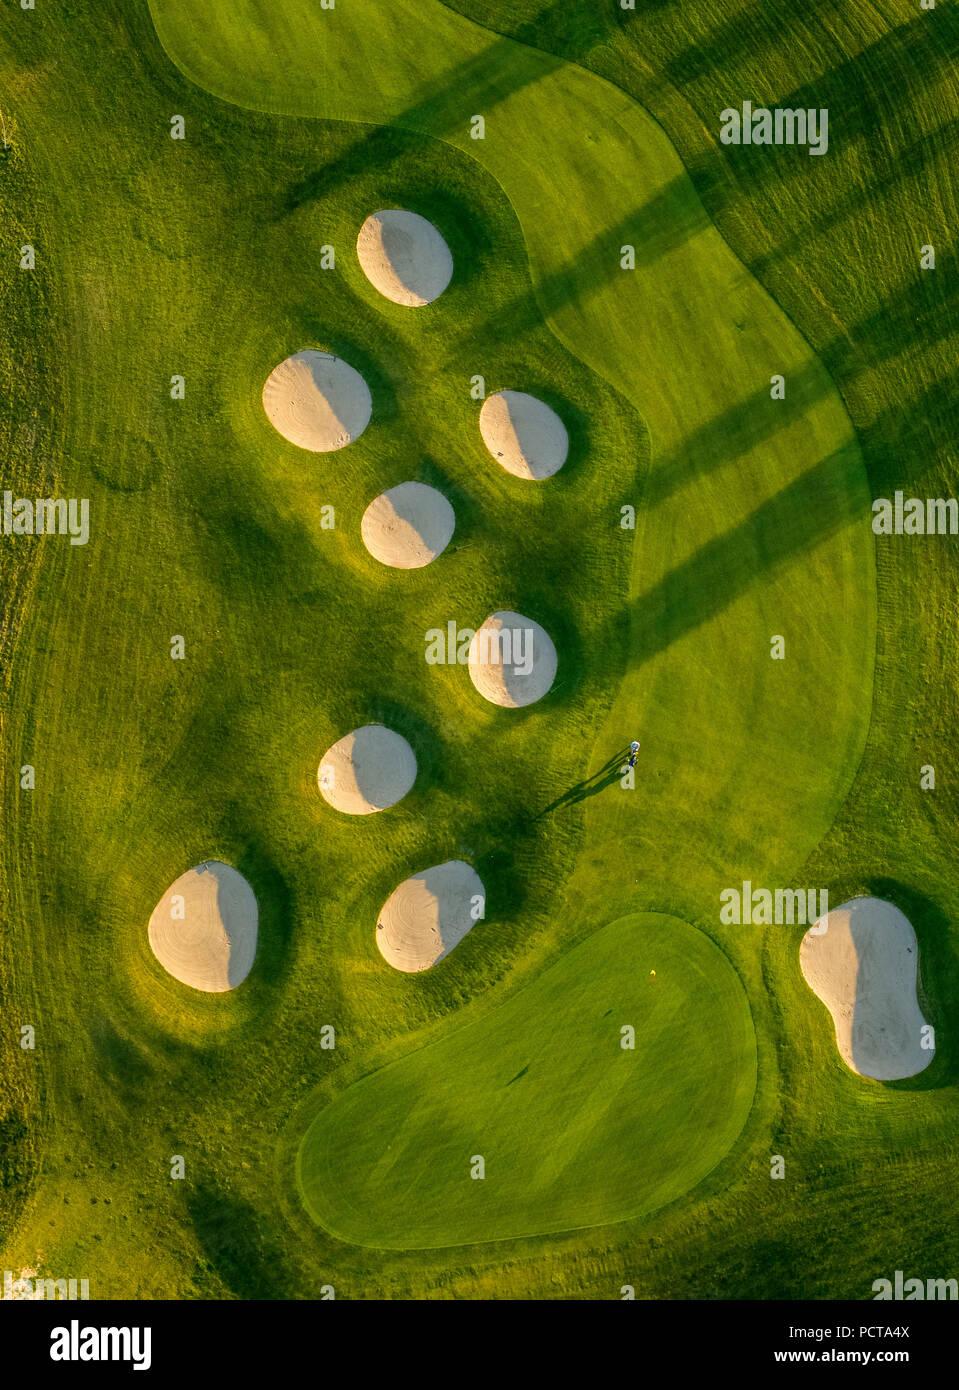 Sand traps, hazards, bunkers, Fleesensee Golf Club, GC Fleesensee, Fleesensee Golf School, golf course, Göhren-Lebbin, Mecklenburg Lake Plateau, Mecklenburg-Western Pomerania, Germany - Stock Image